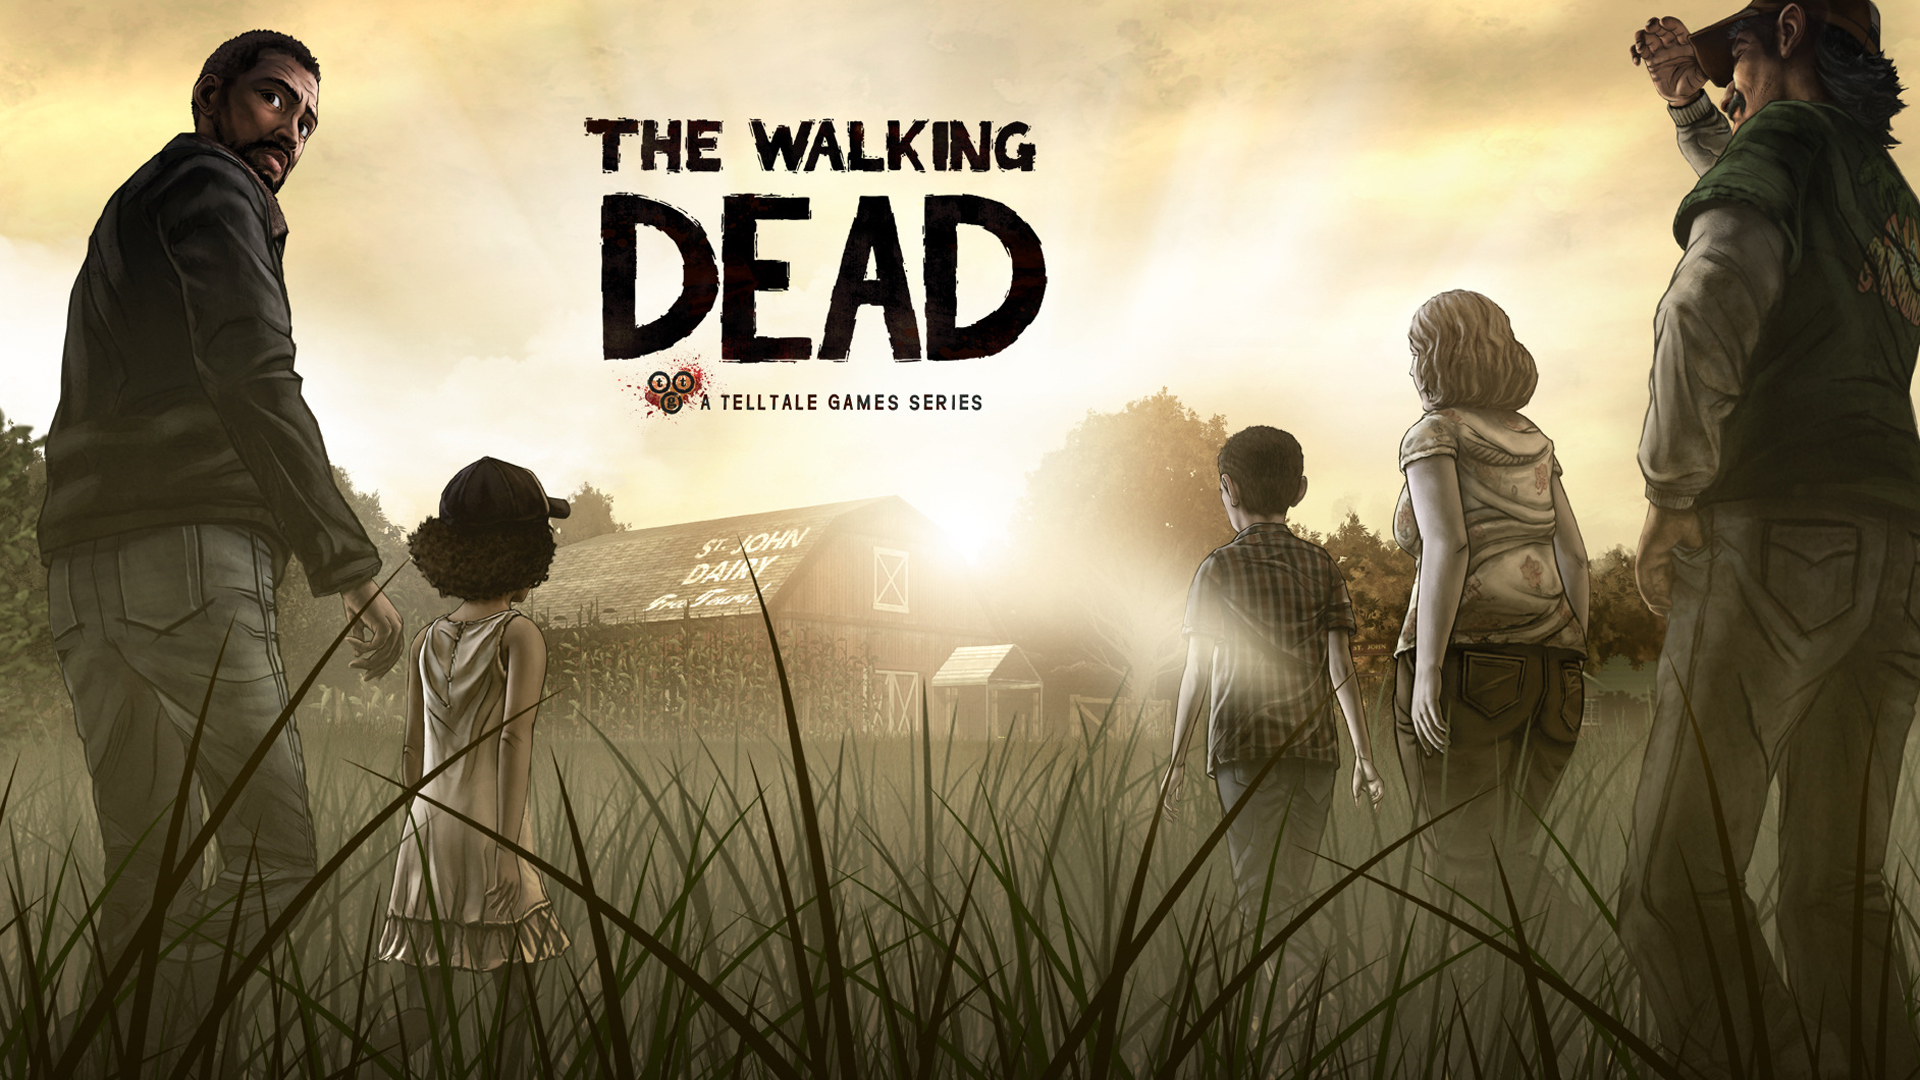 7. Номинация «Я не плачу, просто что-то в глаз попало» - The Walking Dead.